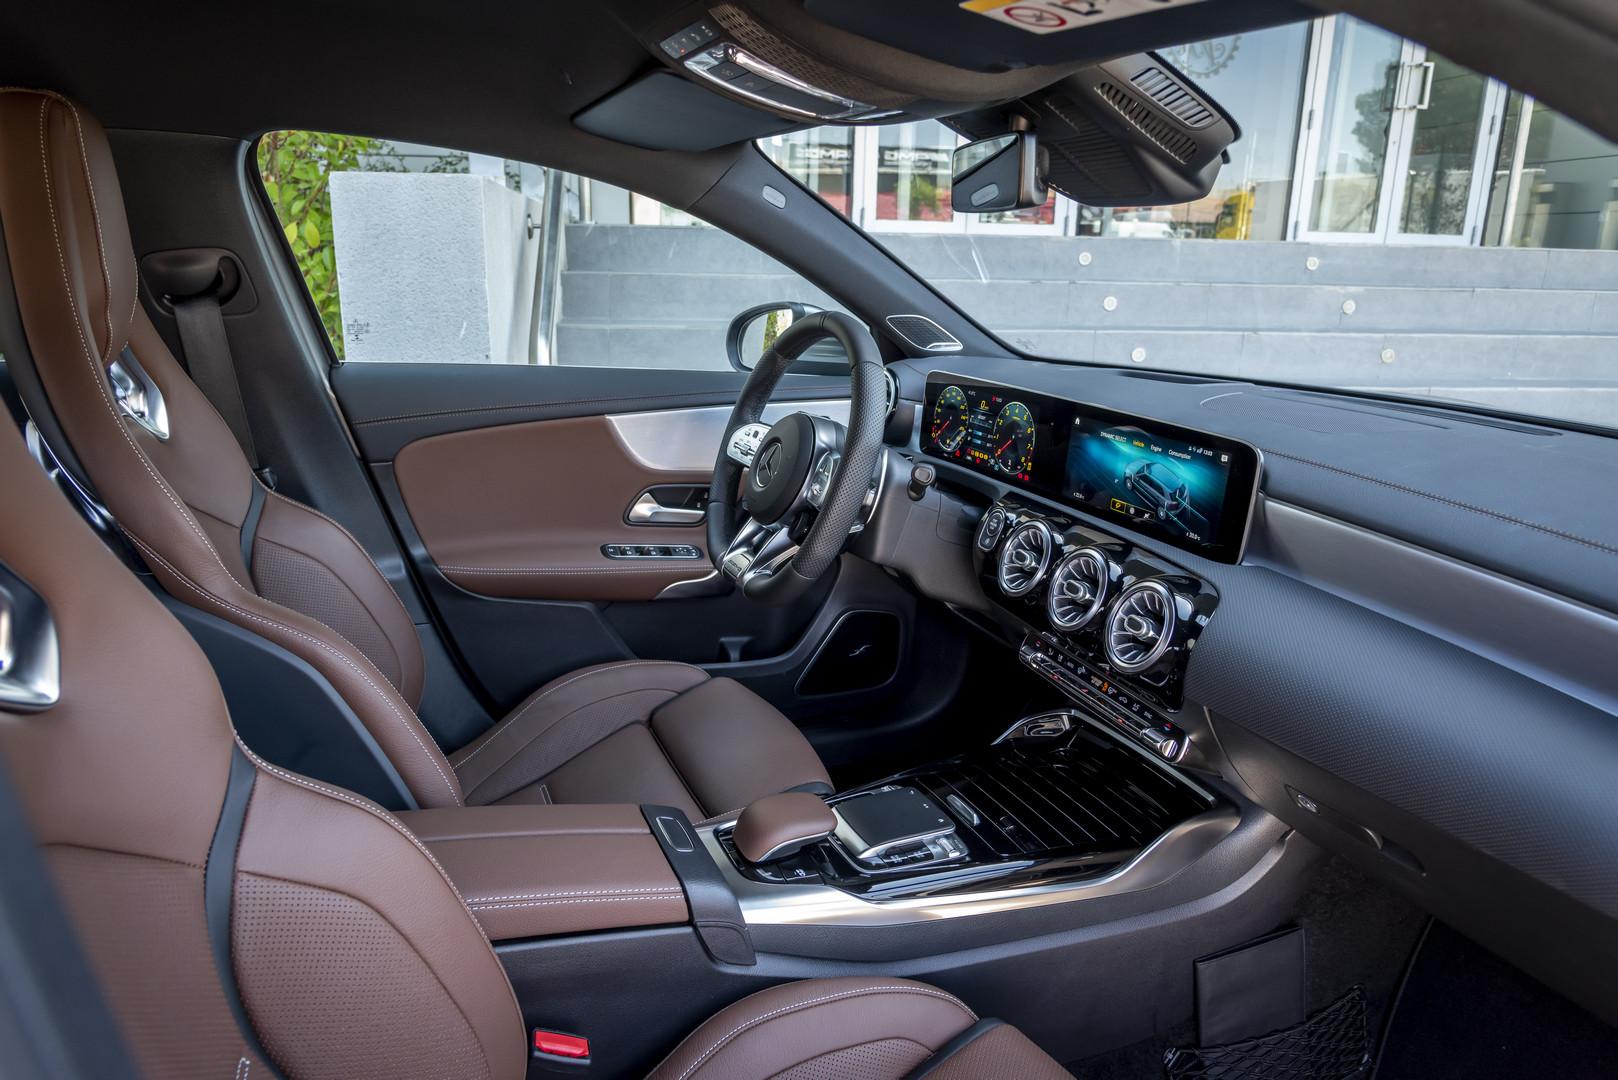 2020 Mercedes-AMG A45 S Seats